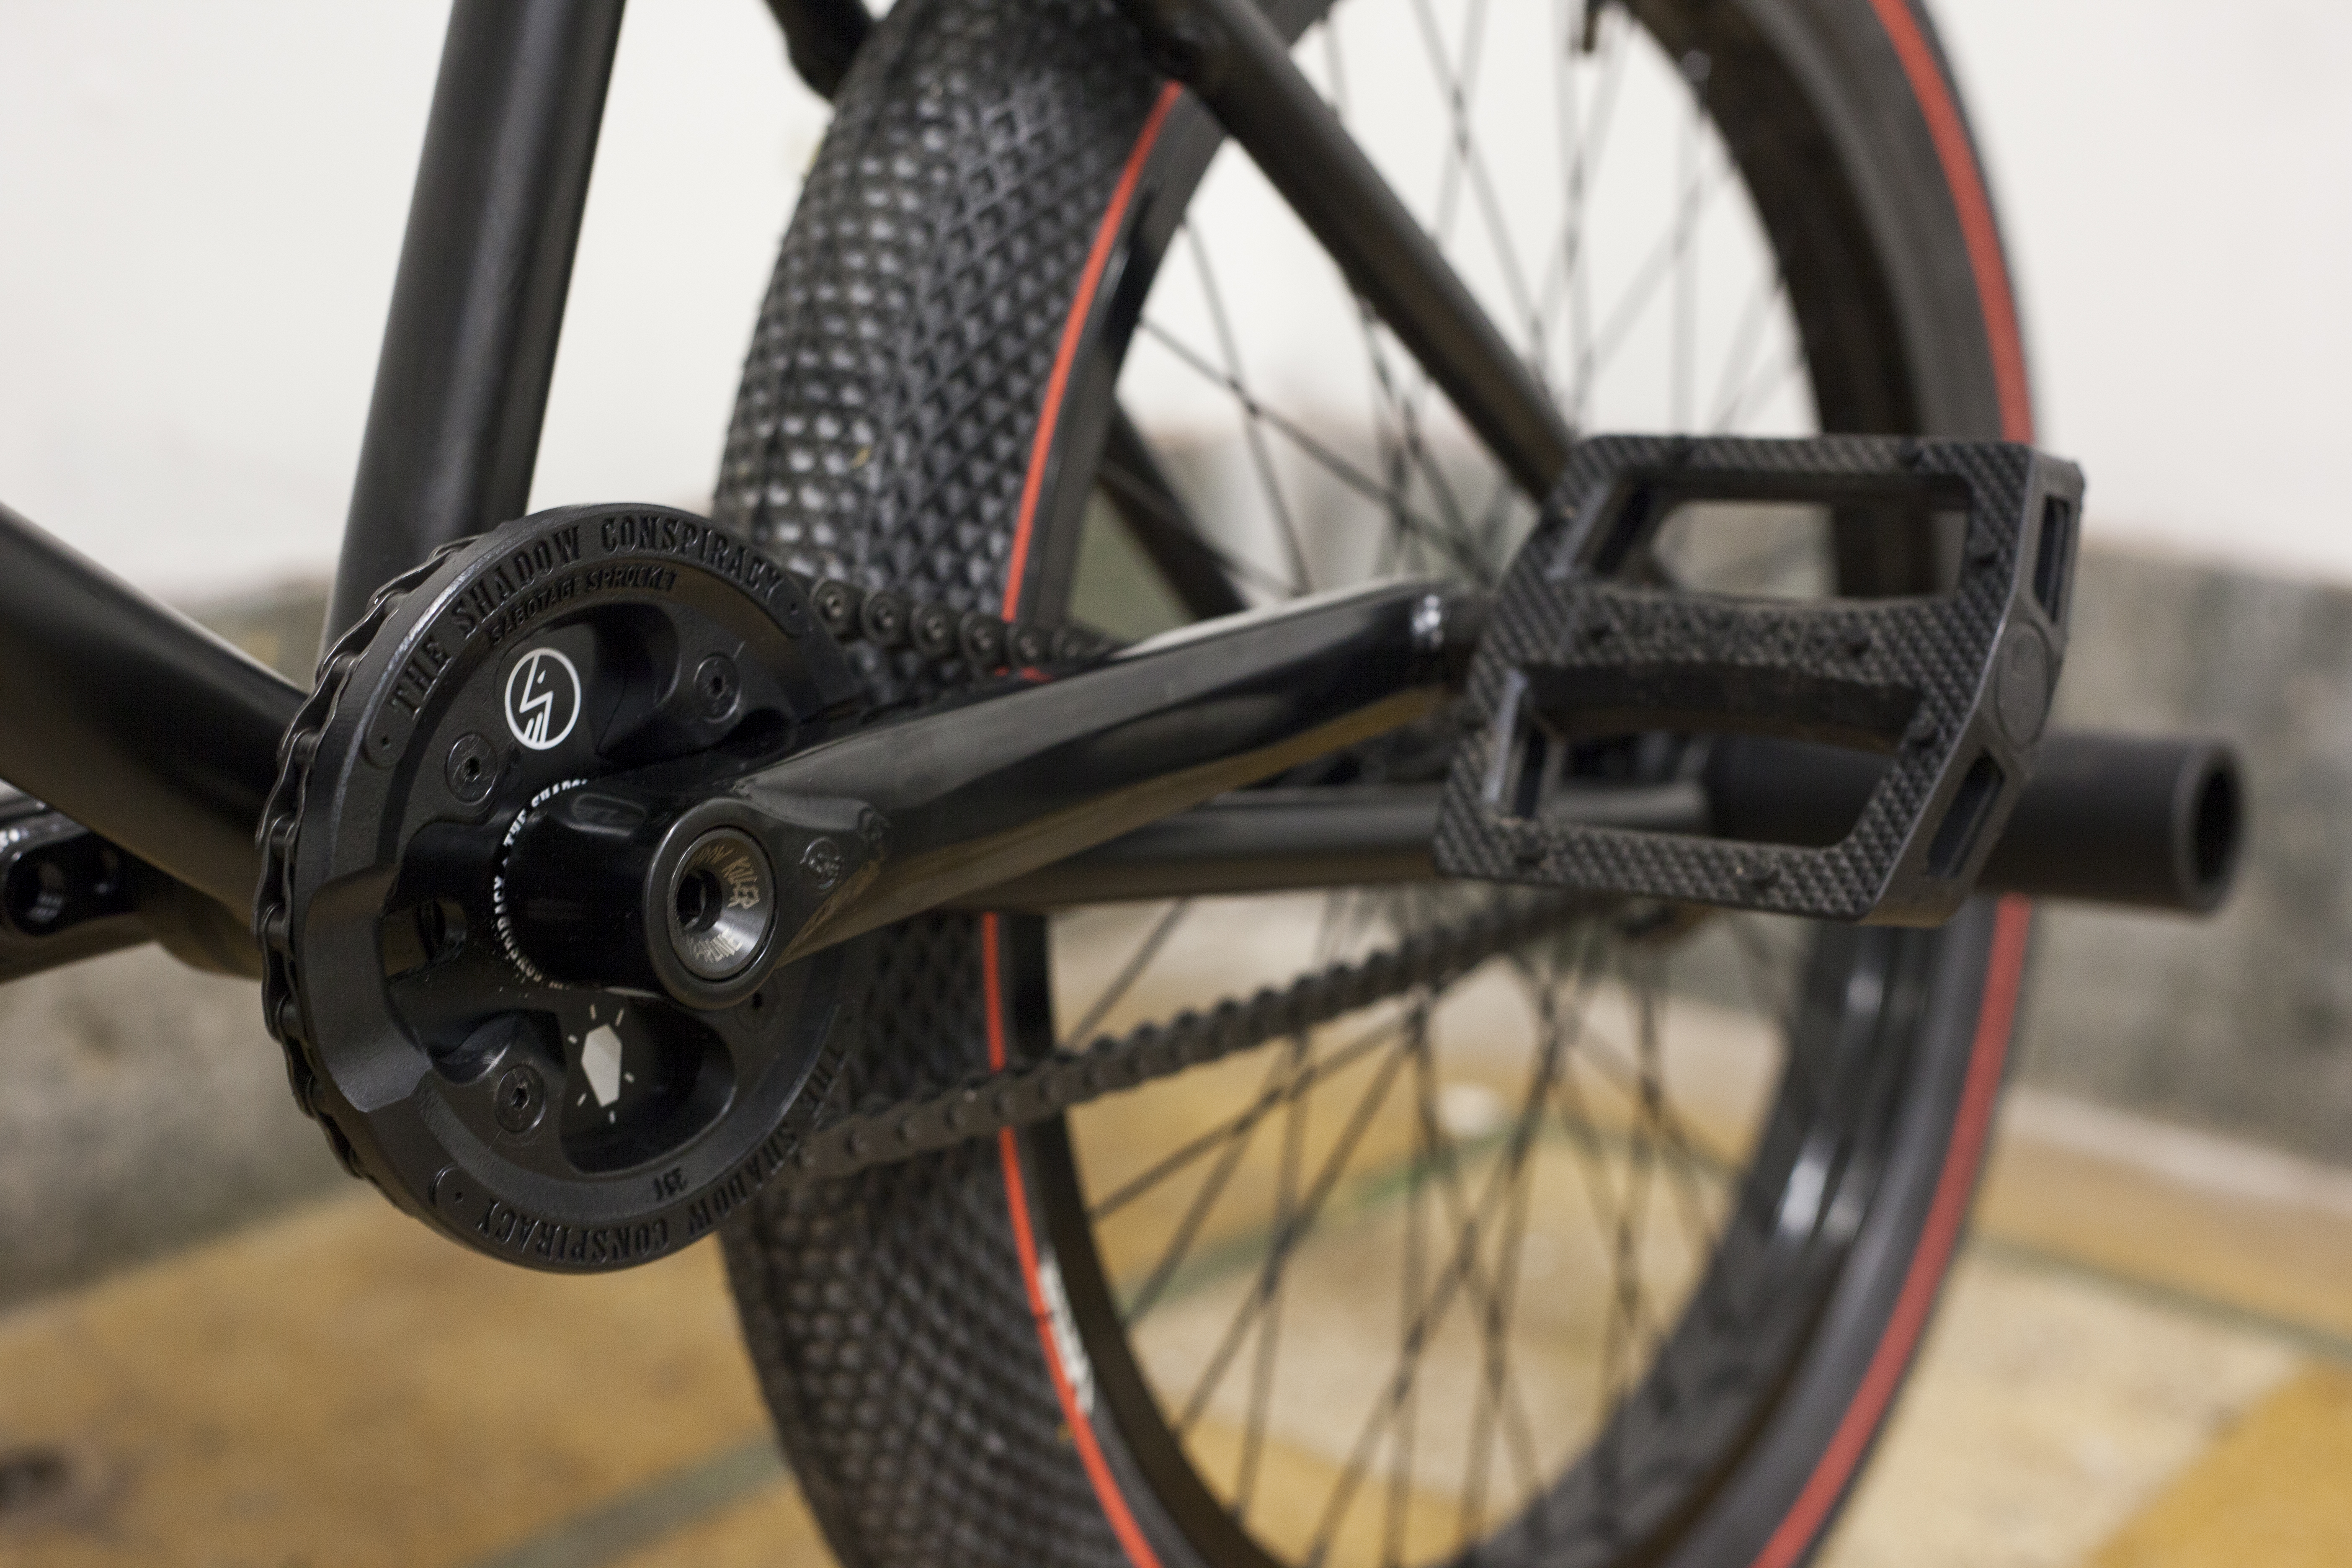 SHADOW CONSPIRACY SABOTAGE REPLACEMENT SPROCKET GUARD 25t BMX BIKE BLACK NEW